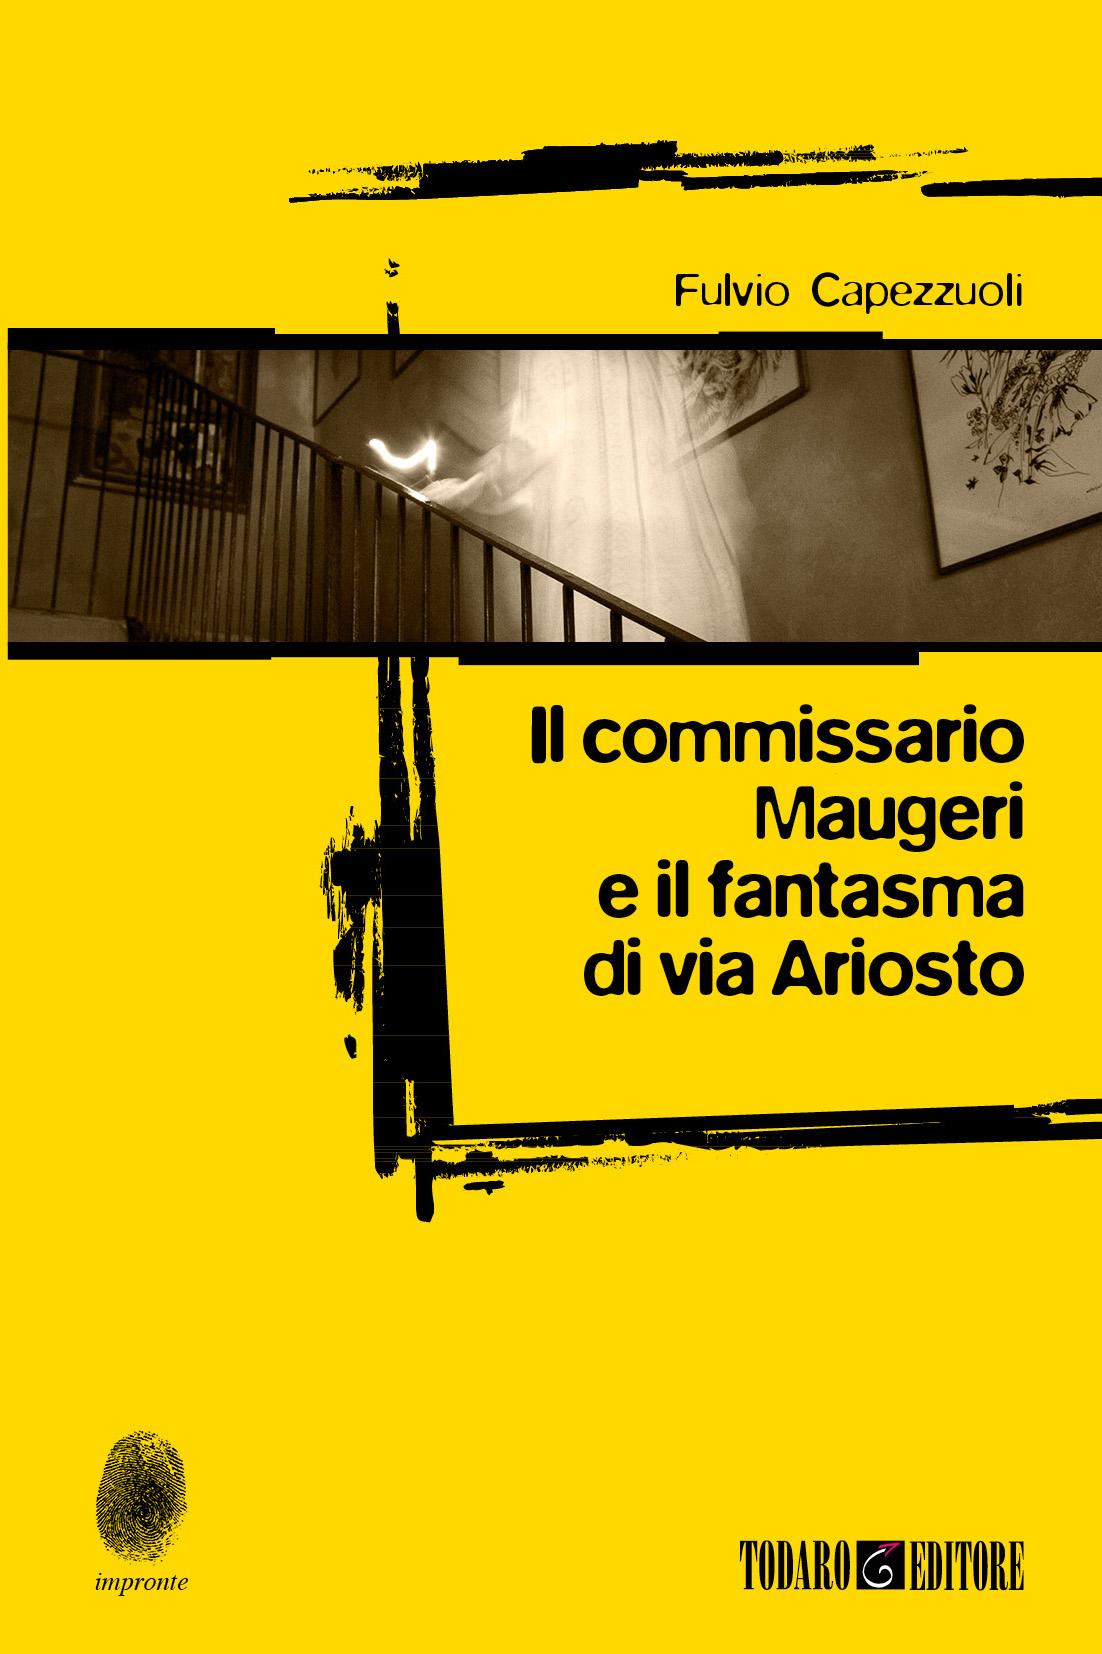 Maugeri e il fantasma di via Ariosto